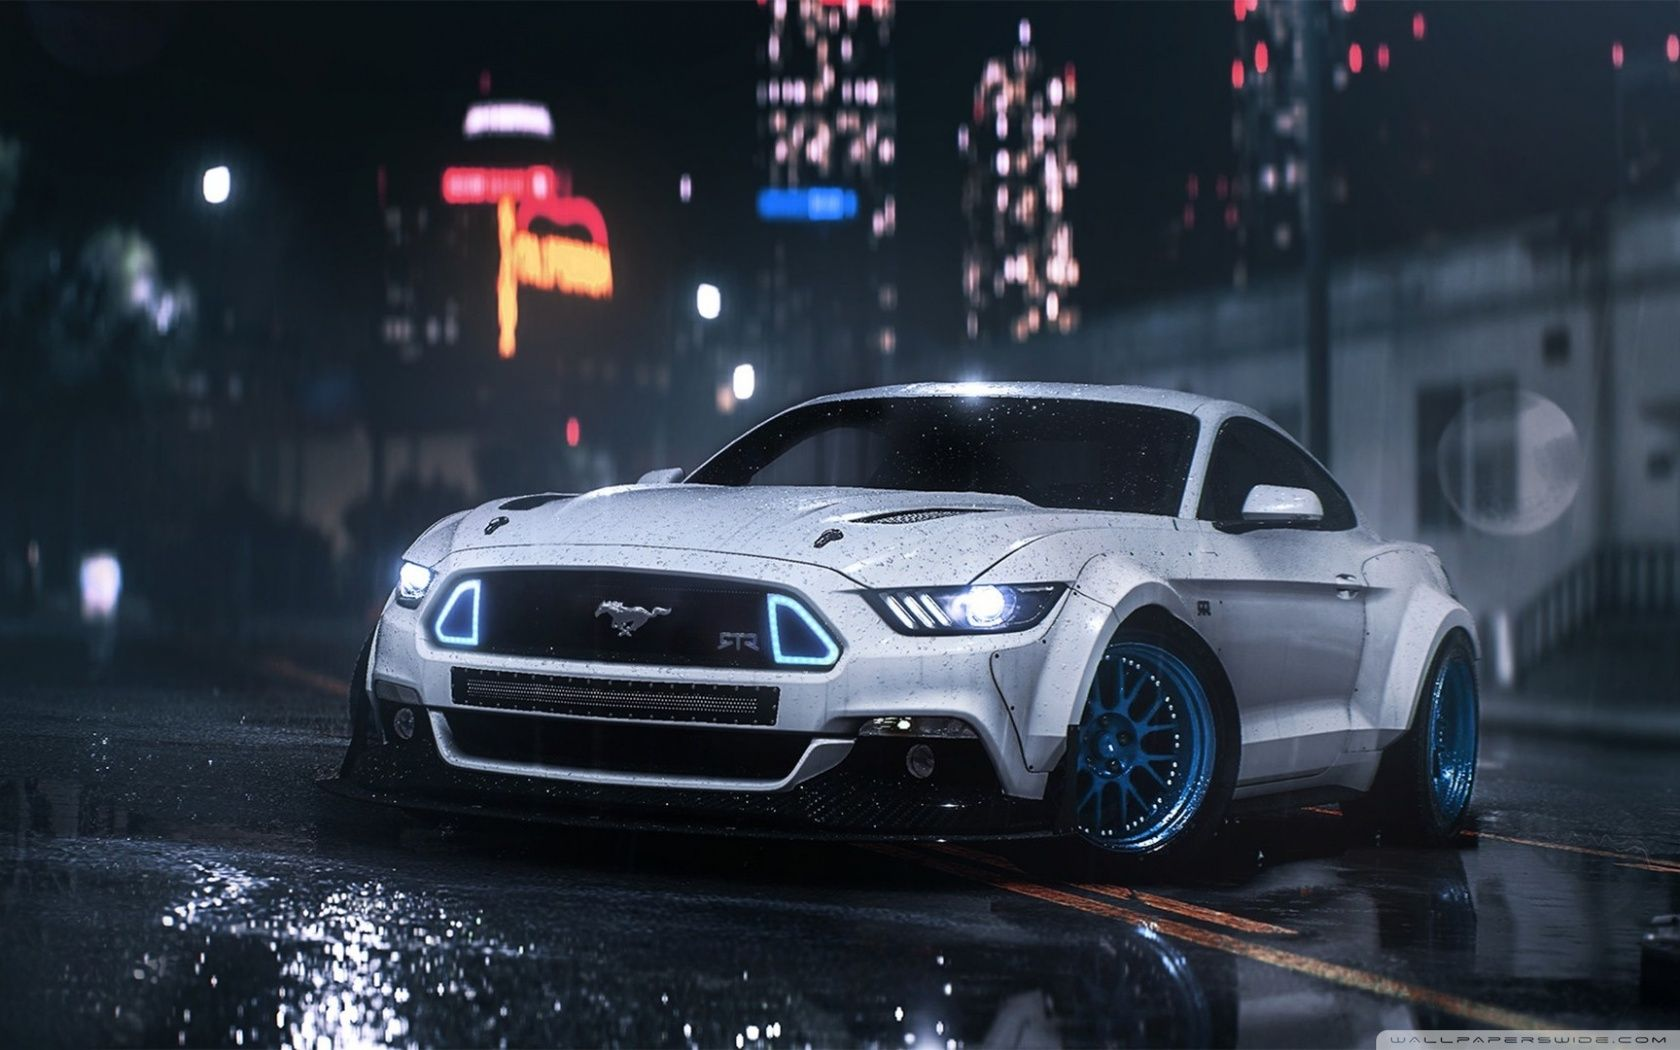 Mustang Wallpapers   Top Mustang Backgrounds   WallpaperAccess 1680x1050